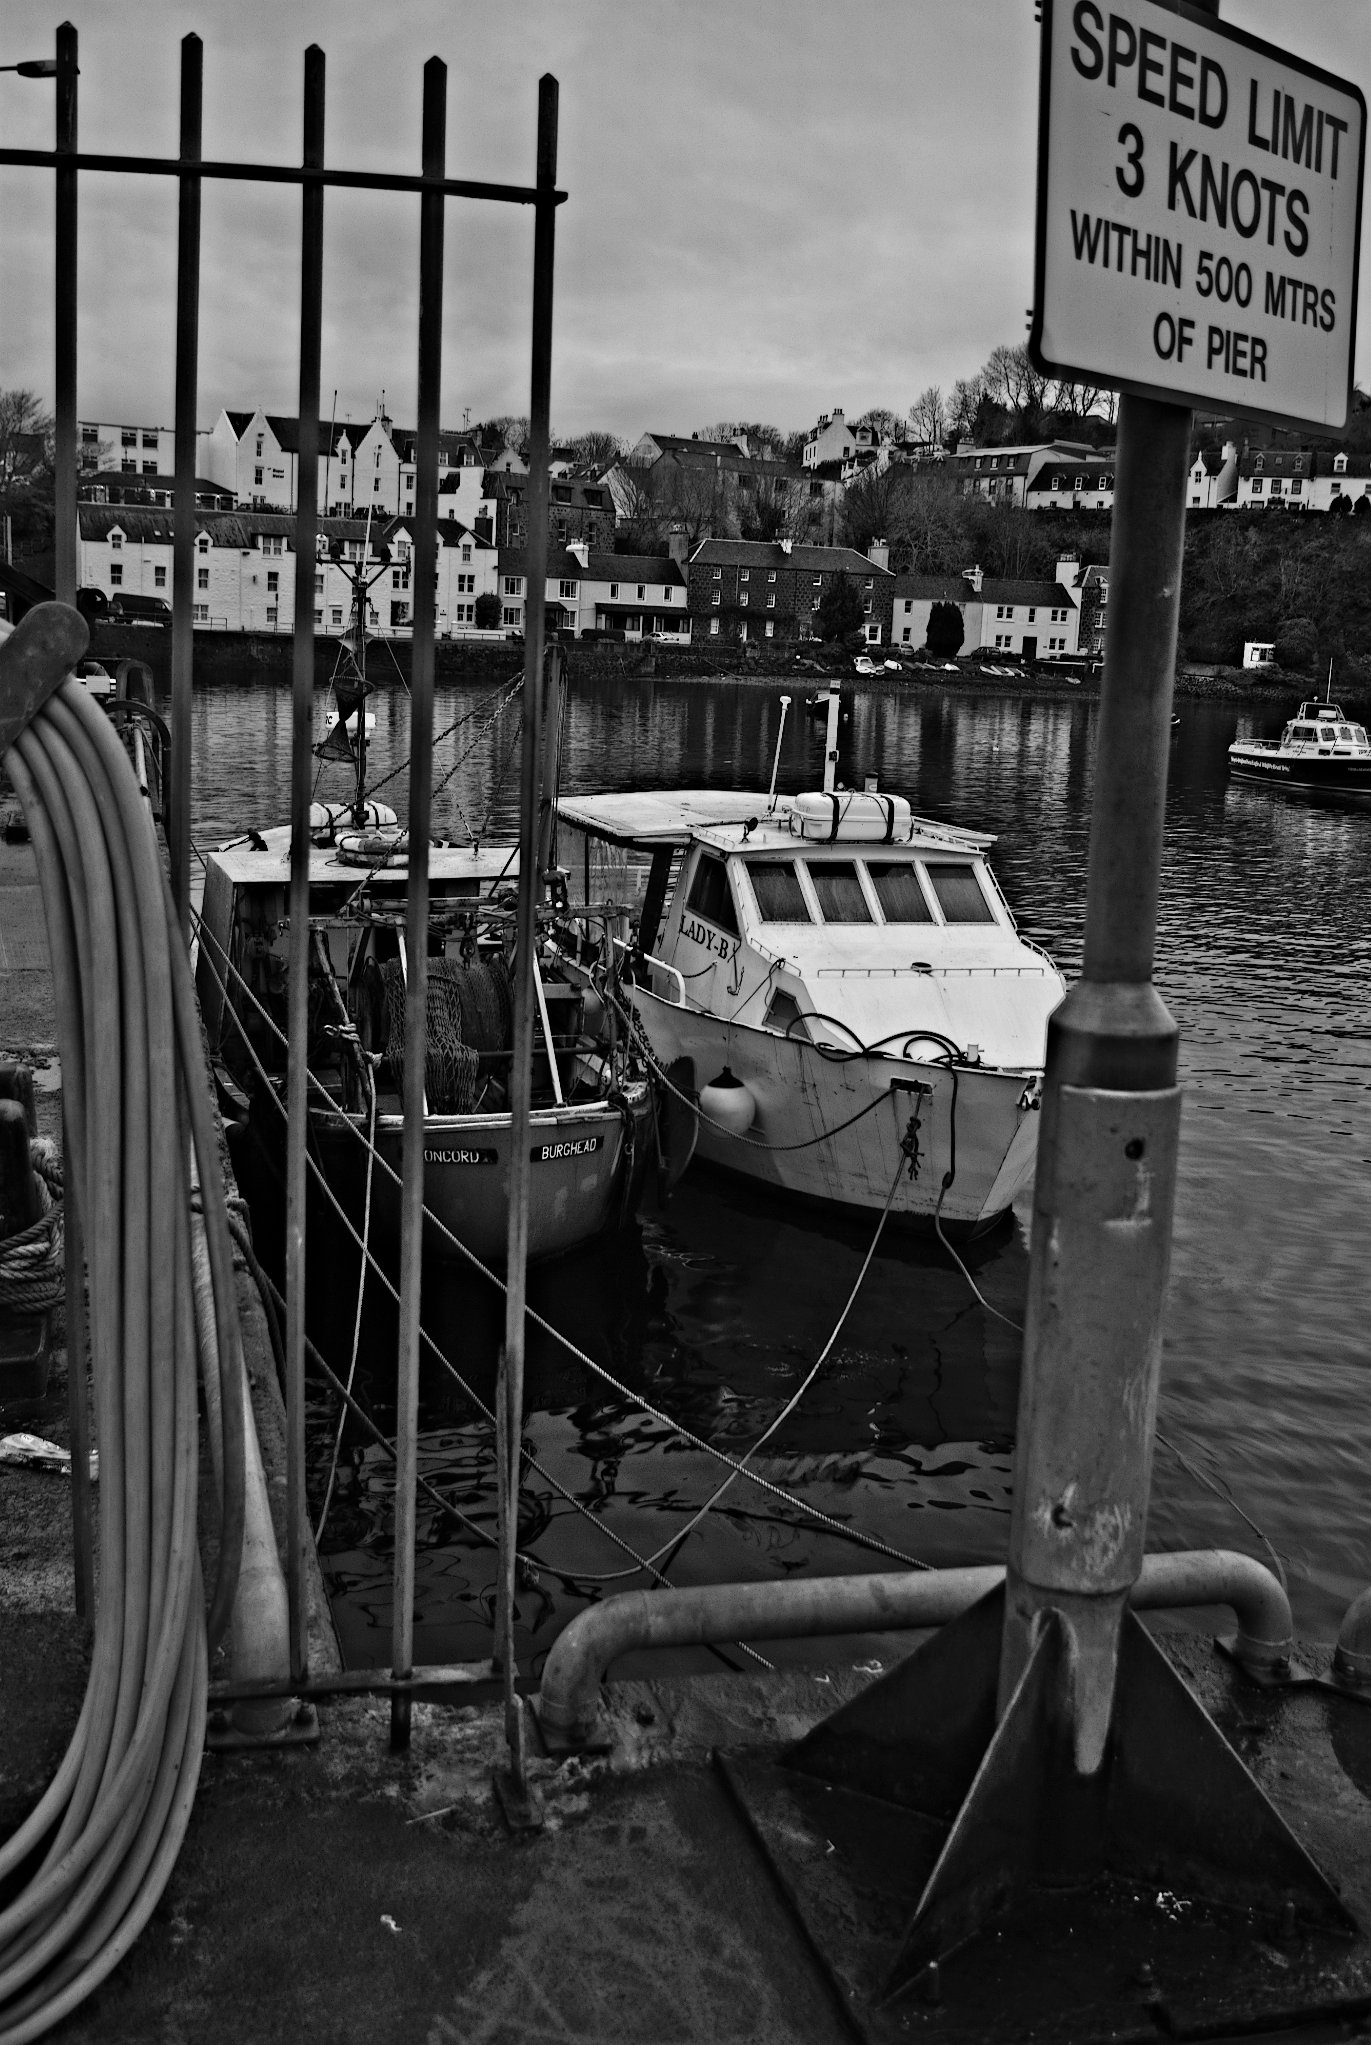 Boats in Portree Harbor, Isle of Skye, Black&white, Boats, Dock, Fishing, HQ Photo